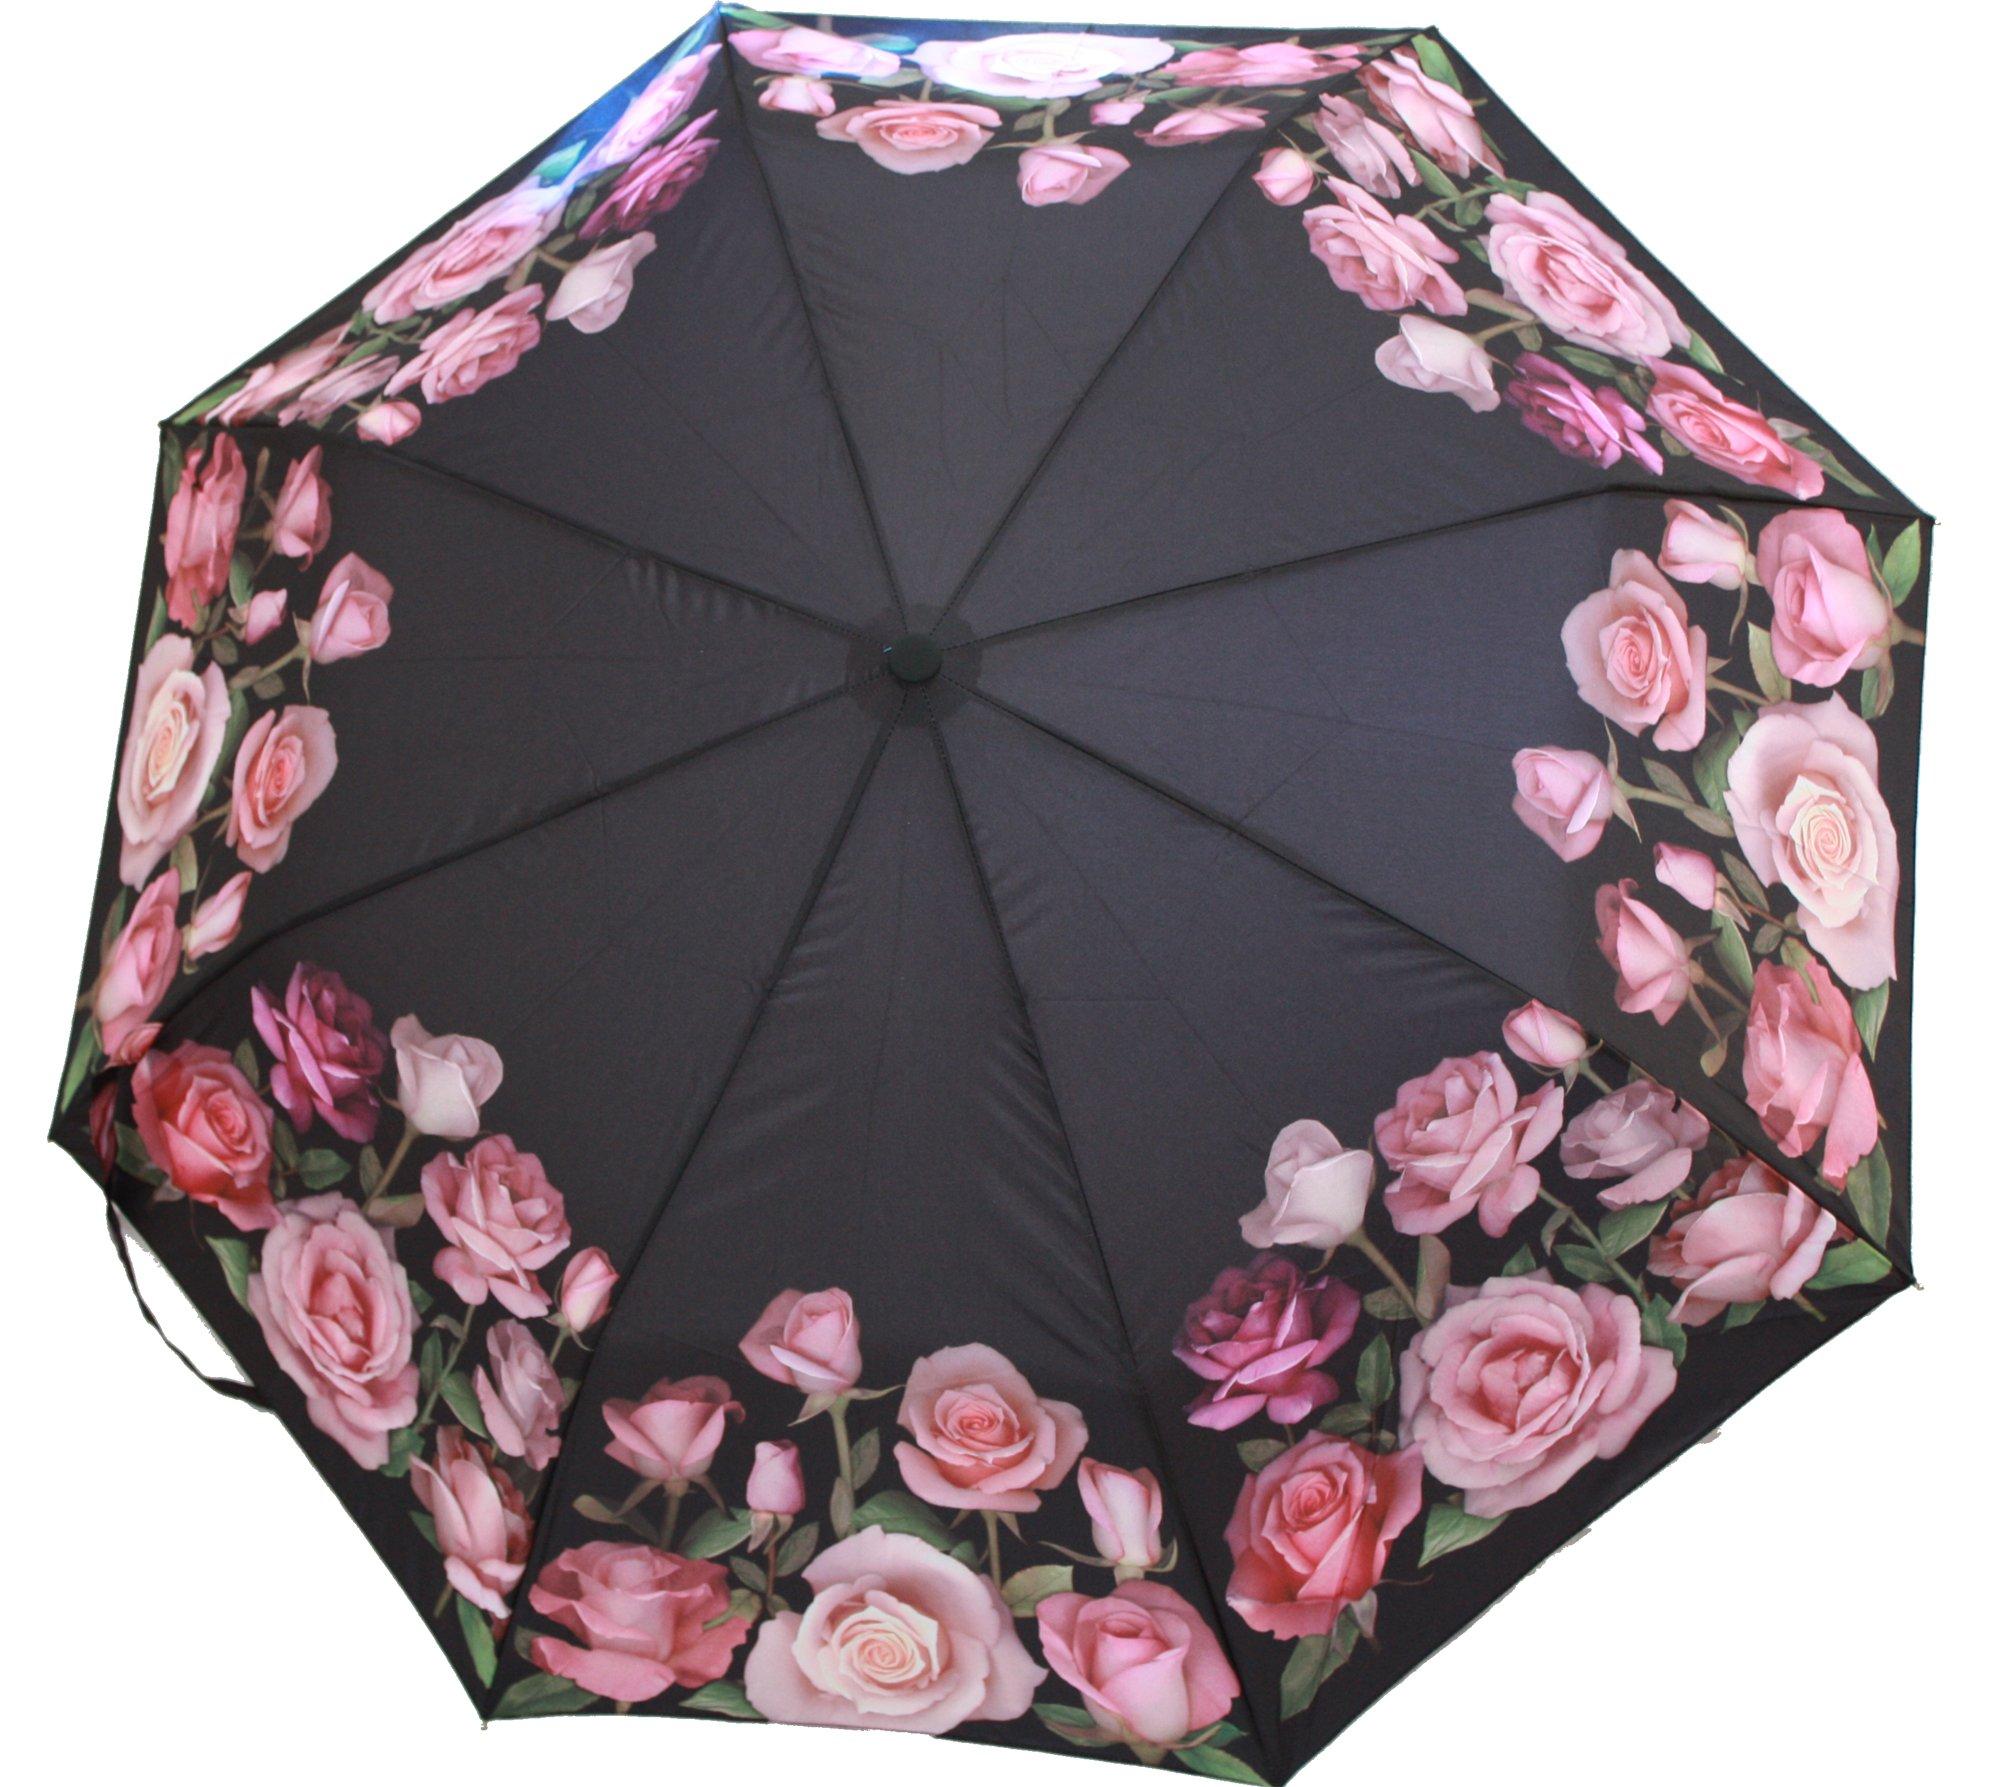 Rose Bouquet Fine Art Roses Automatic Opening Folding Umbrella